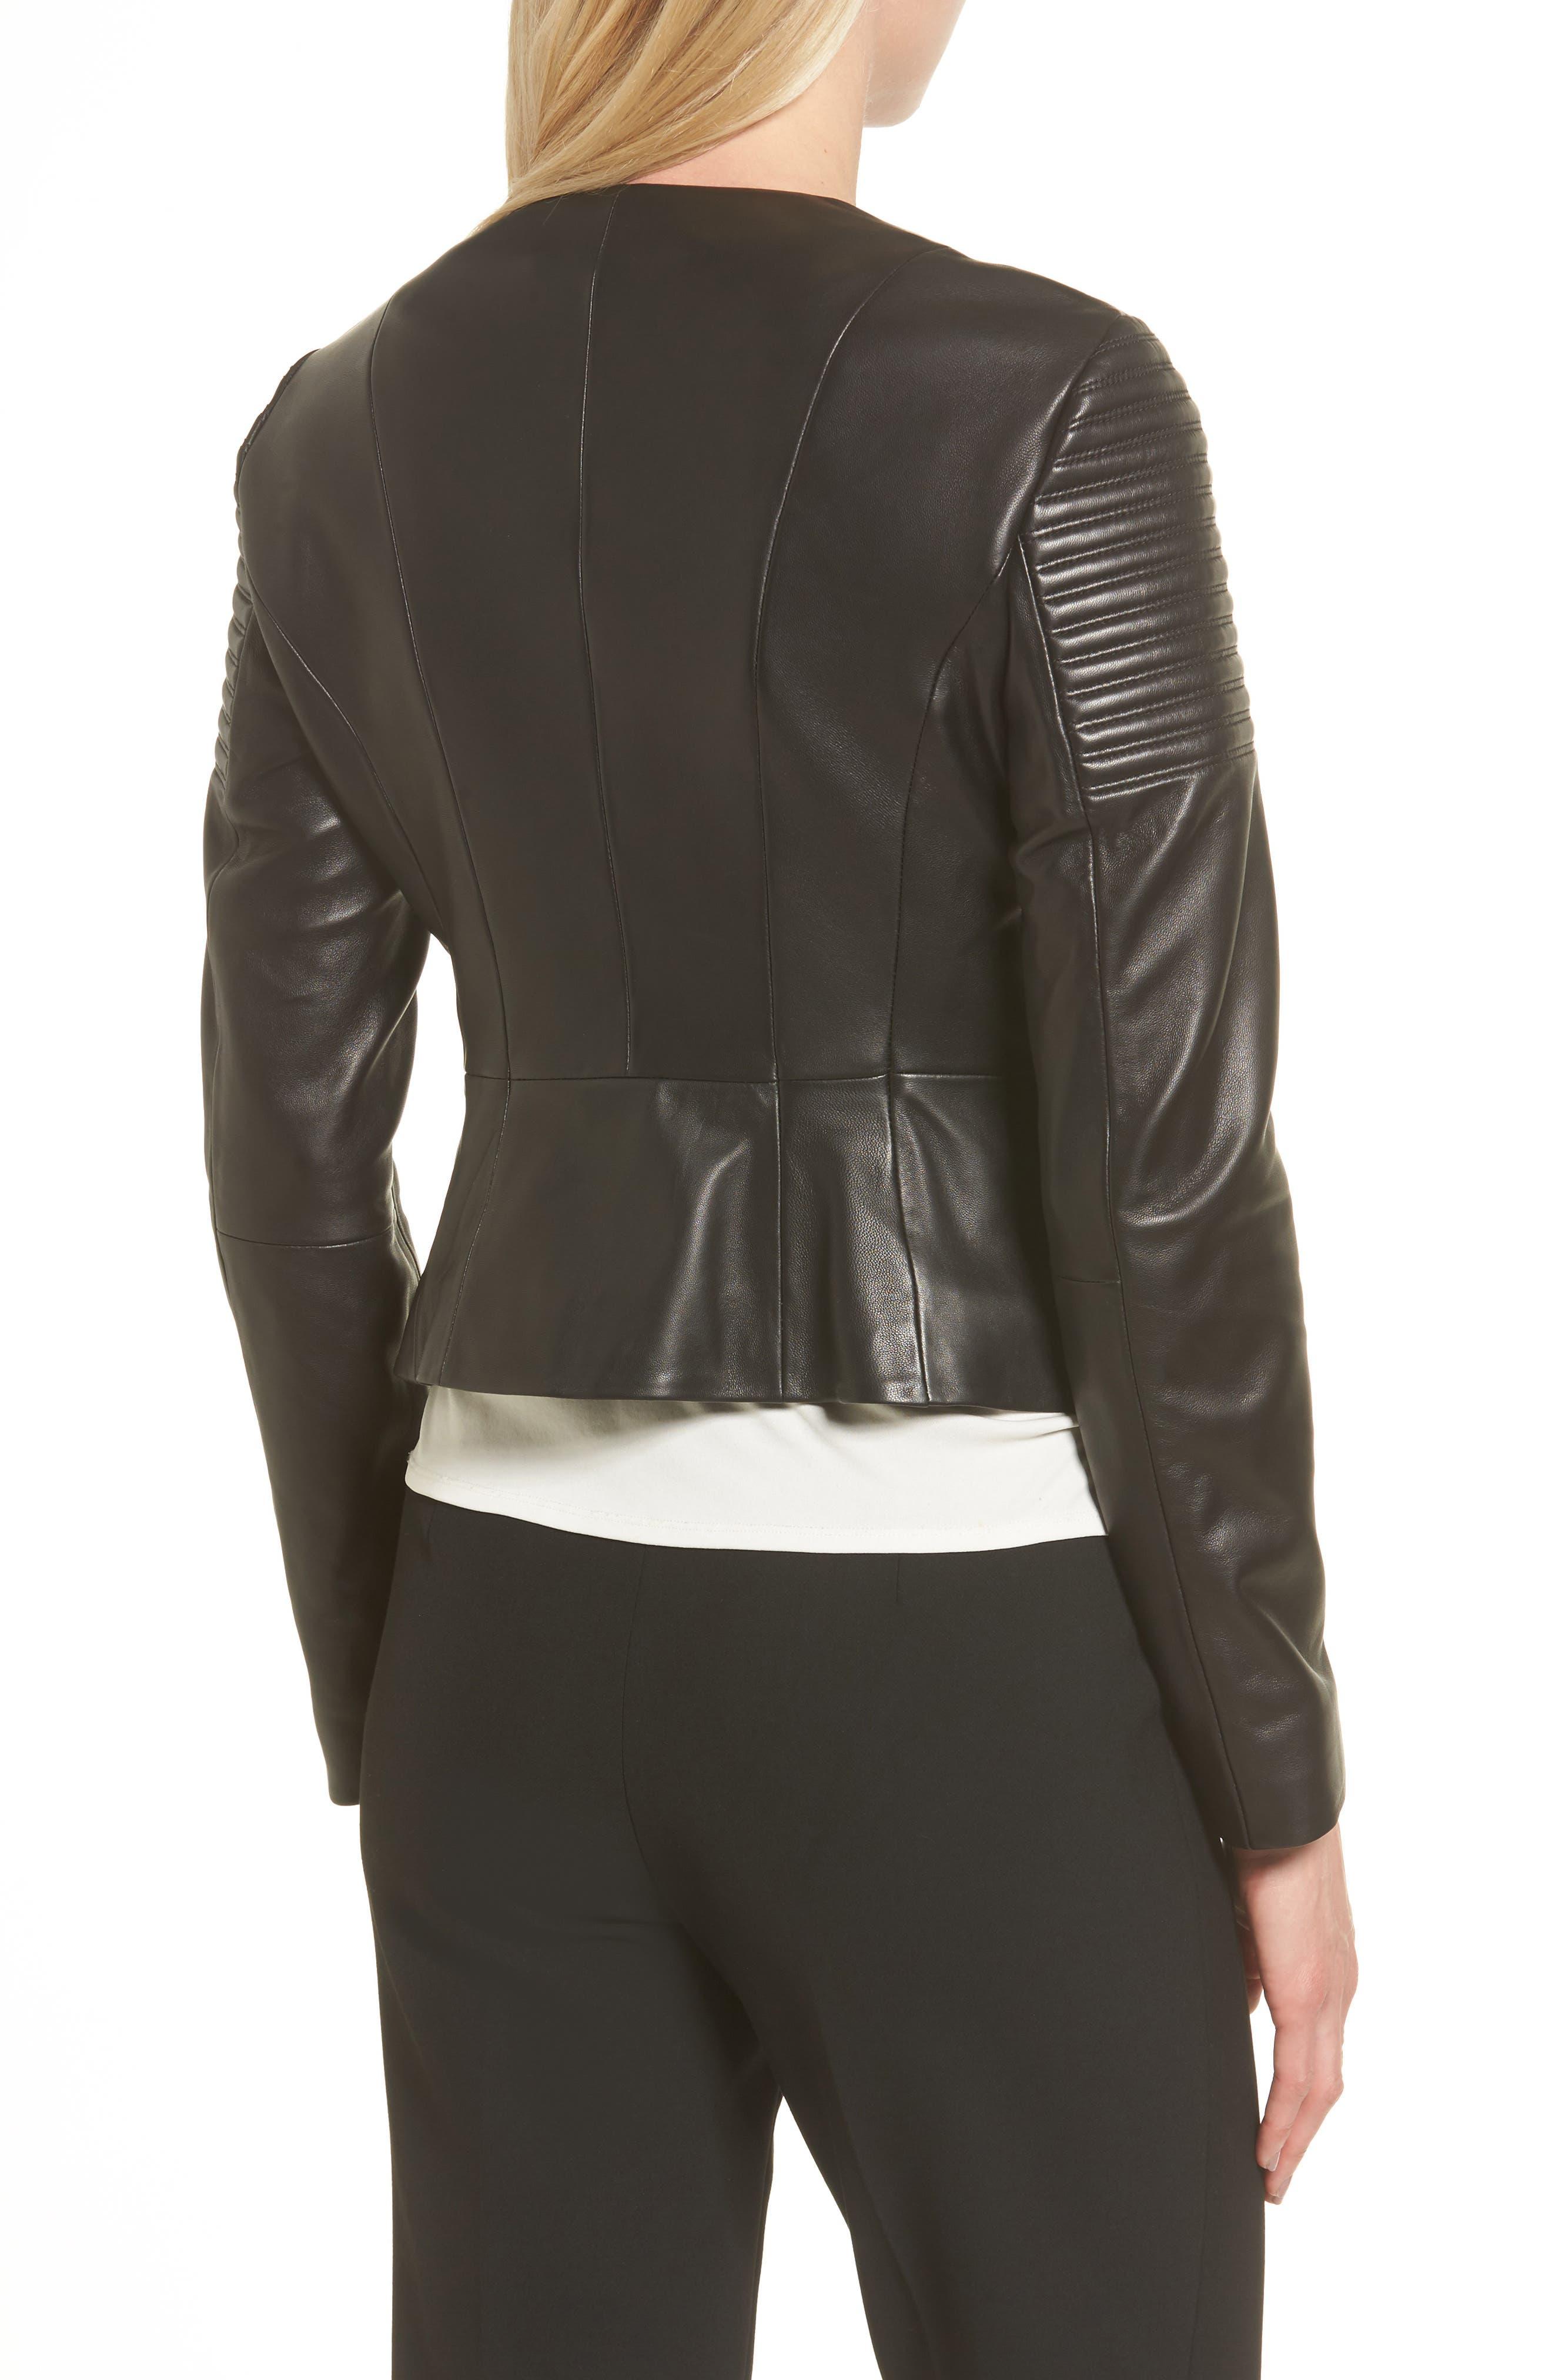 Sakumaya Leather Jacket,                             Alternate thumbnail 2, color,                             Black